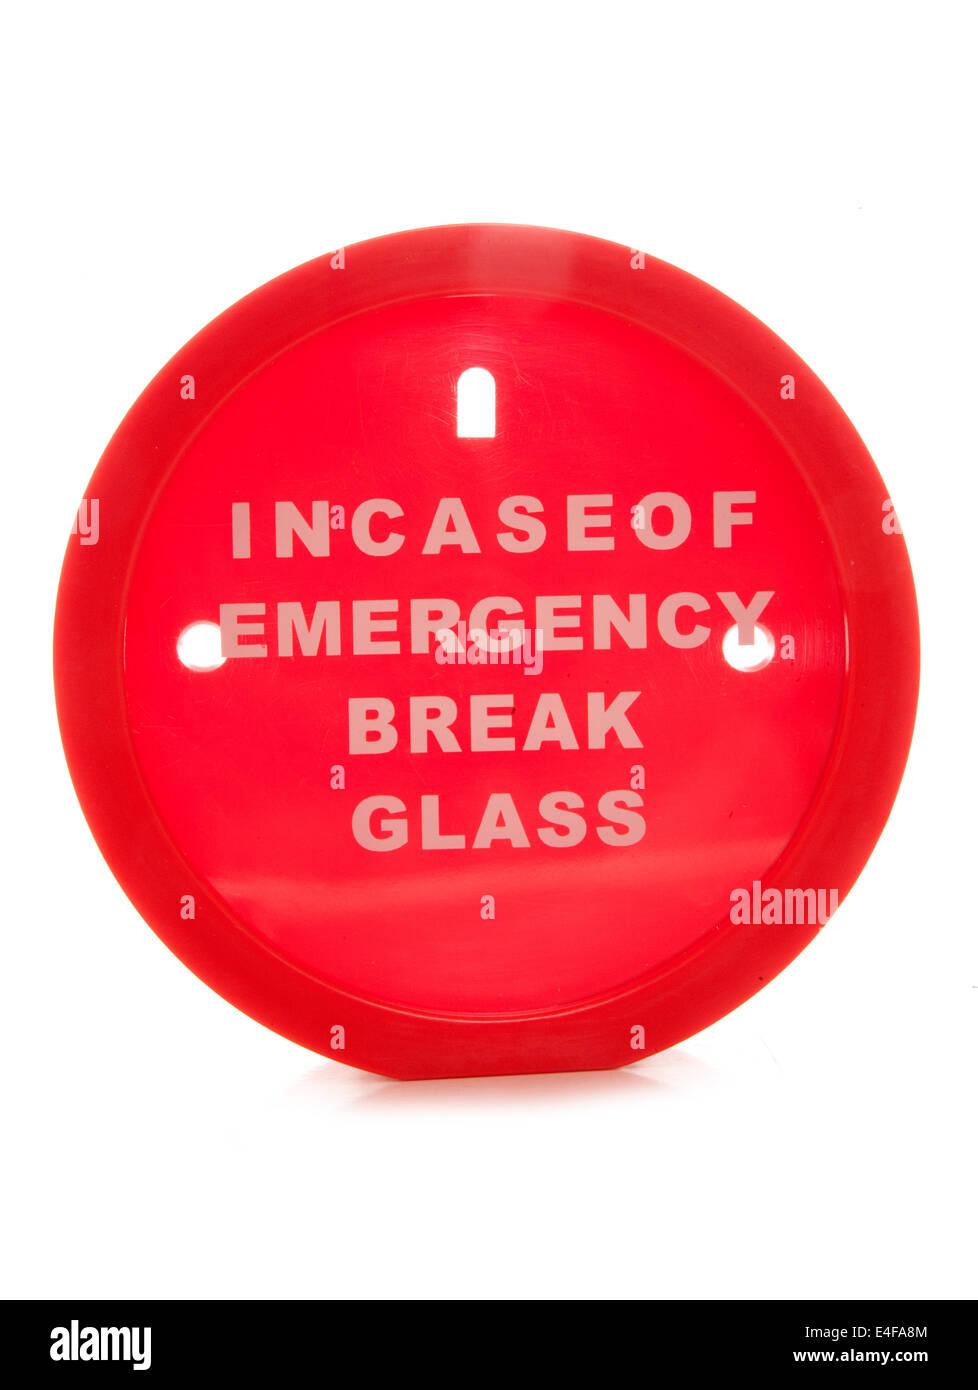 Incase of emergency break glass money box cutout - Stock Image